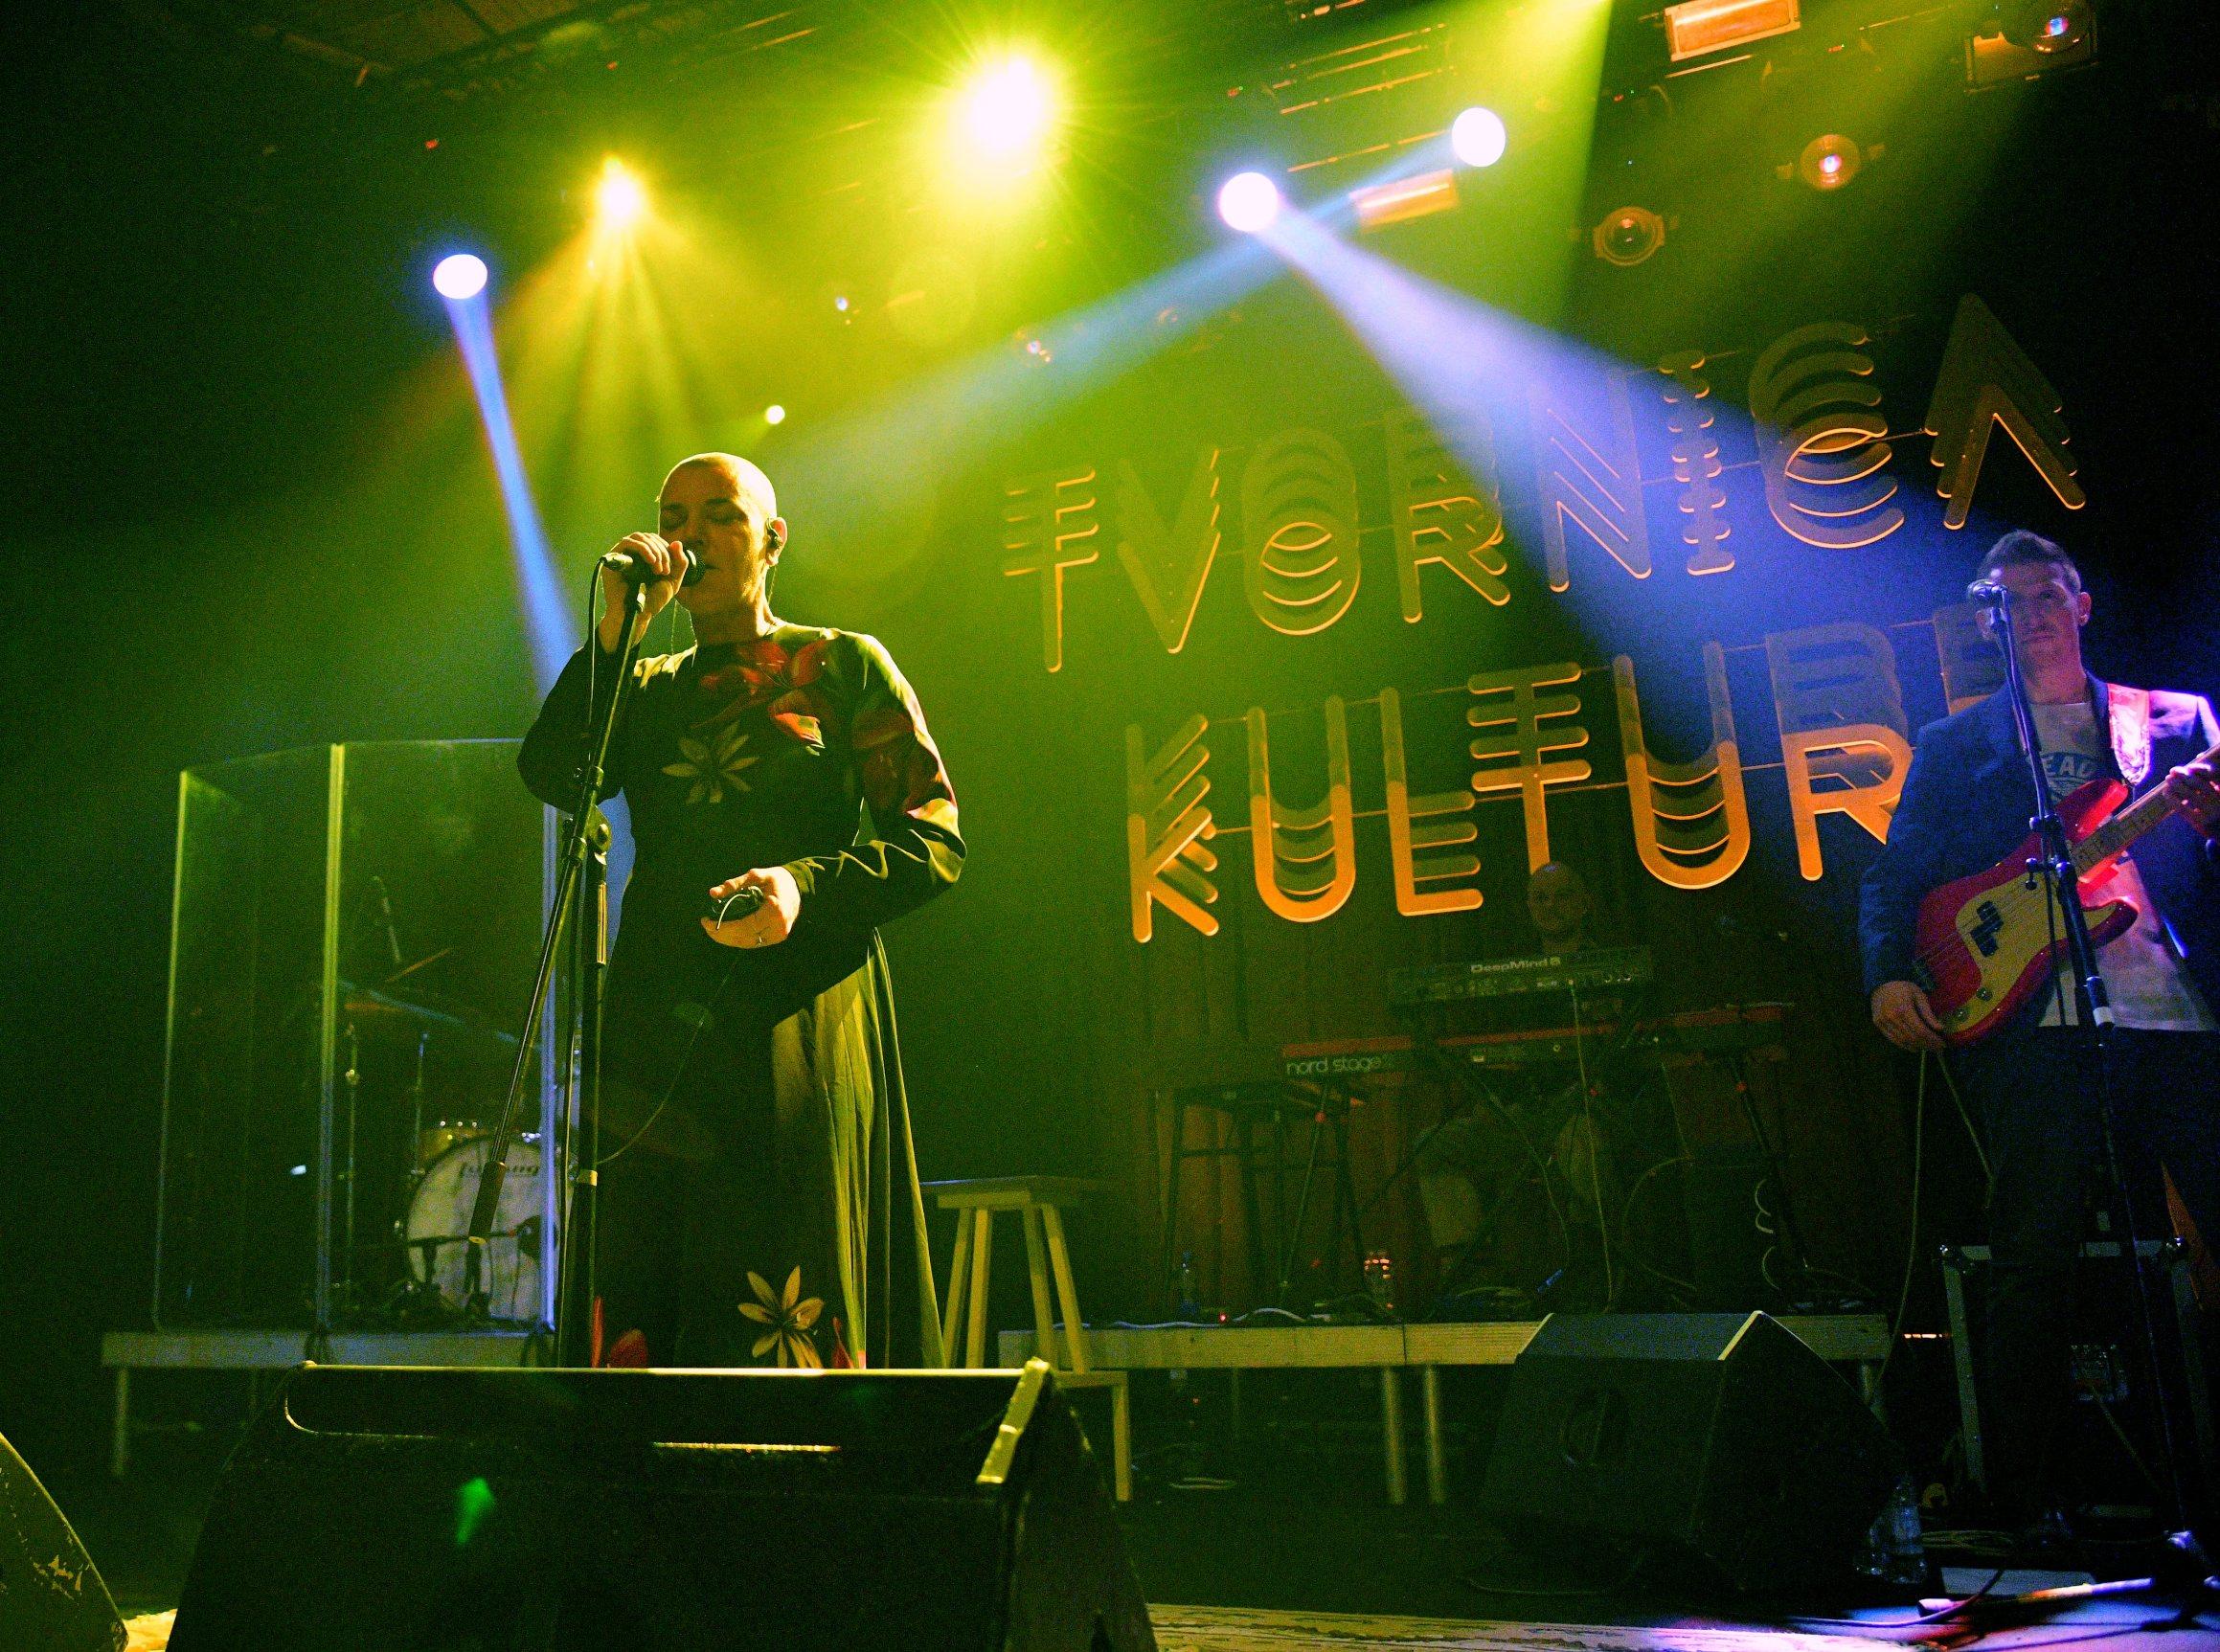 Zagreb, 150120. Tvornica kulture, Subiceva. Koncert Sinead O'Connor u Tvornici. Foto: Srdjan Vrancic / CROPIX